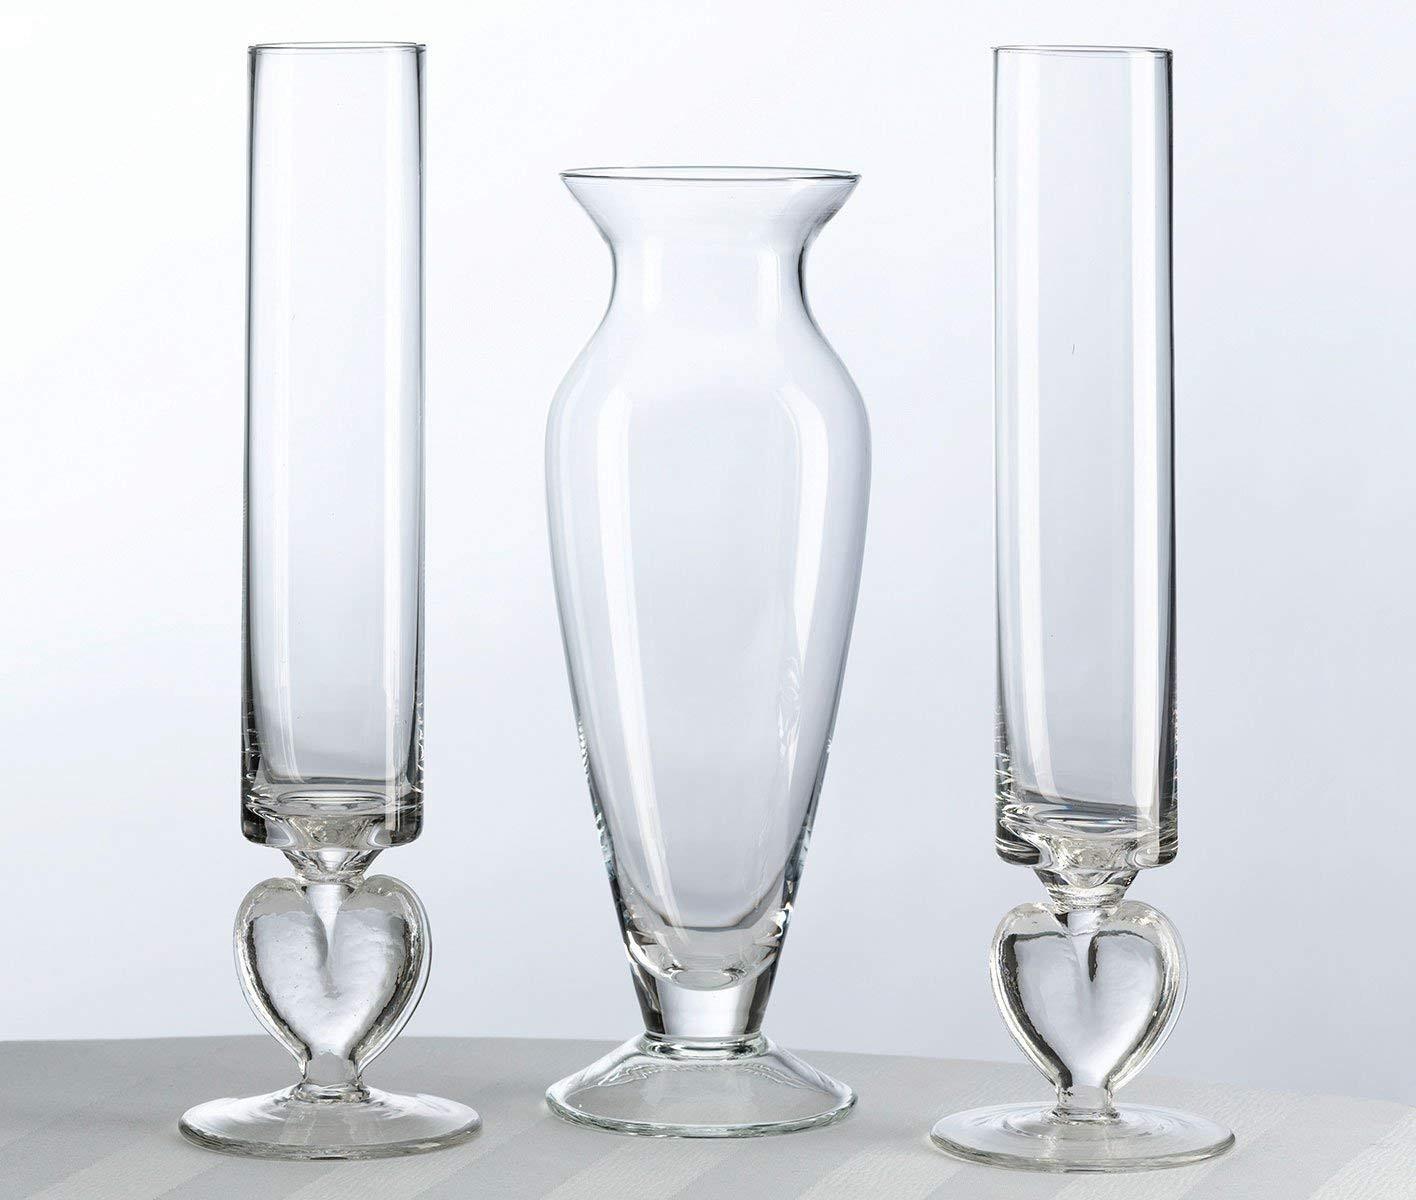 5 clear glass square vases of amazon com lillian rose unity sand ceremony wedding vase set home for amazon com lillian rose unity sand ceremony wedding vase set home kitchen